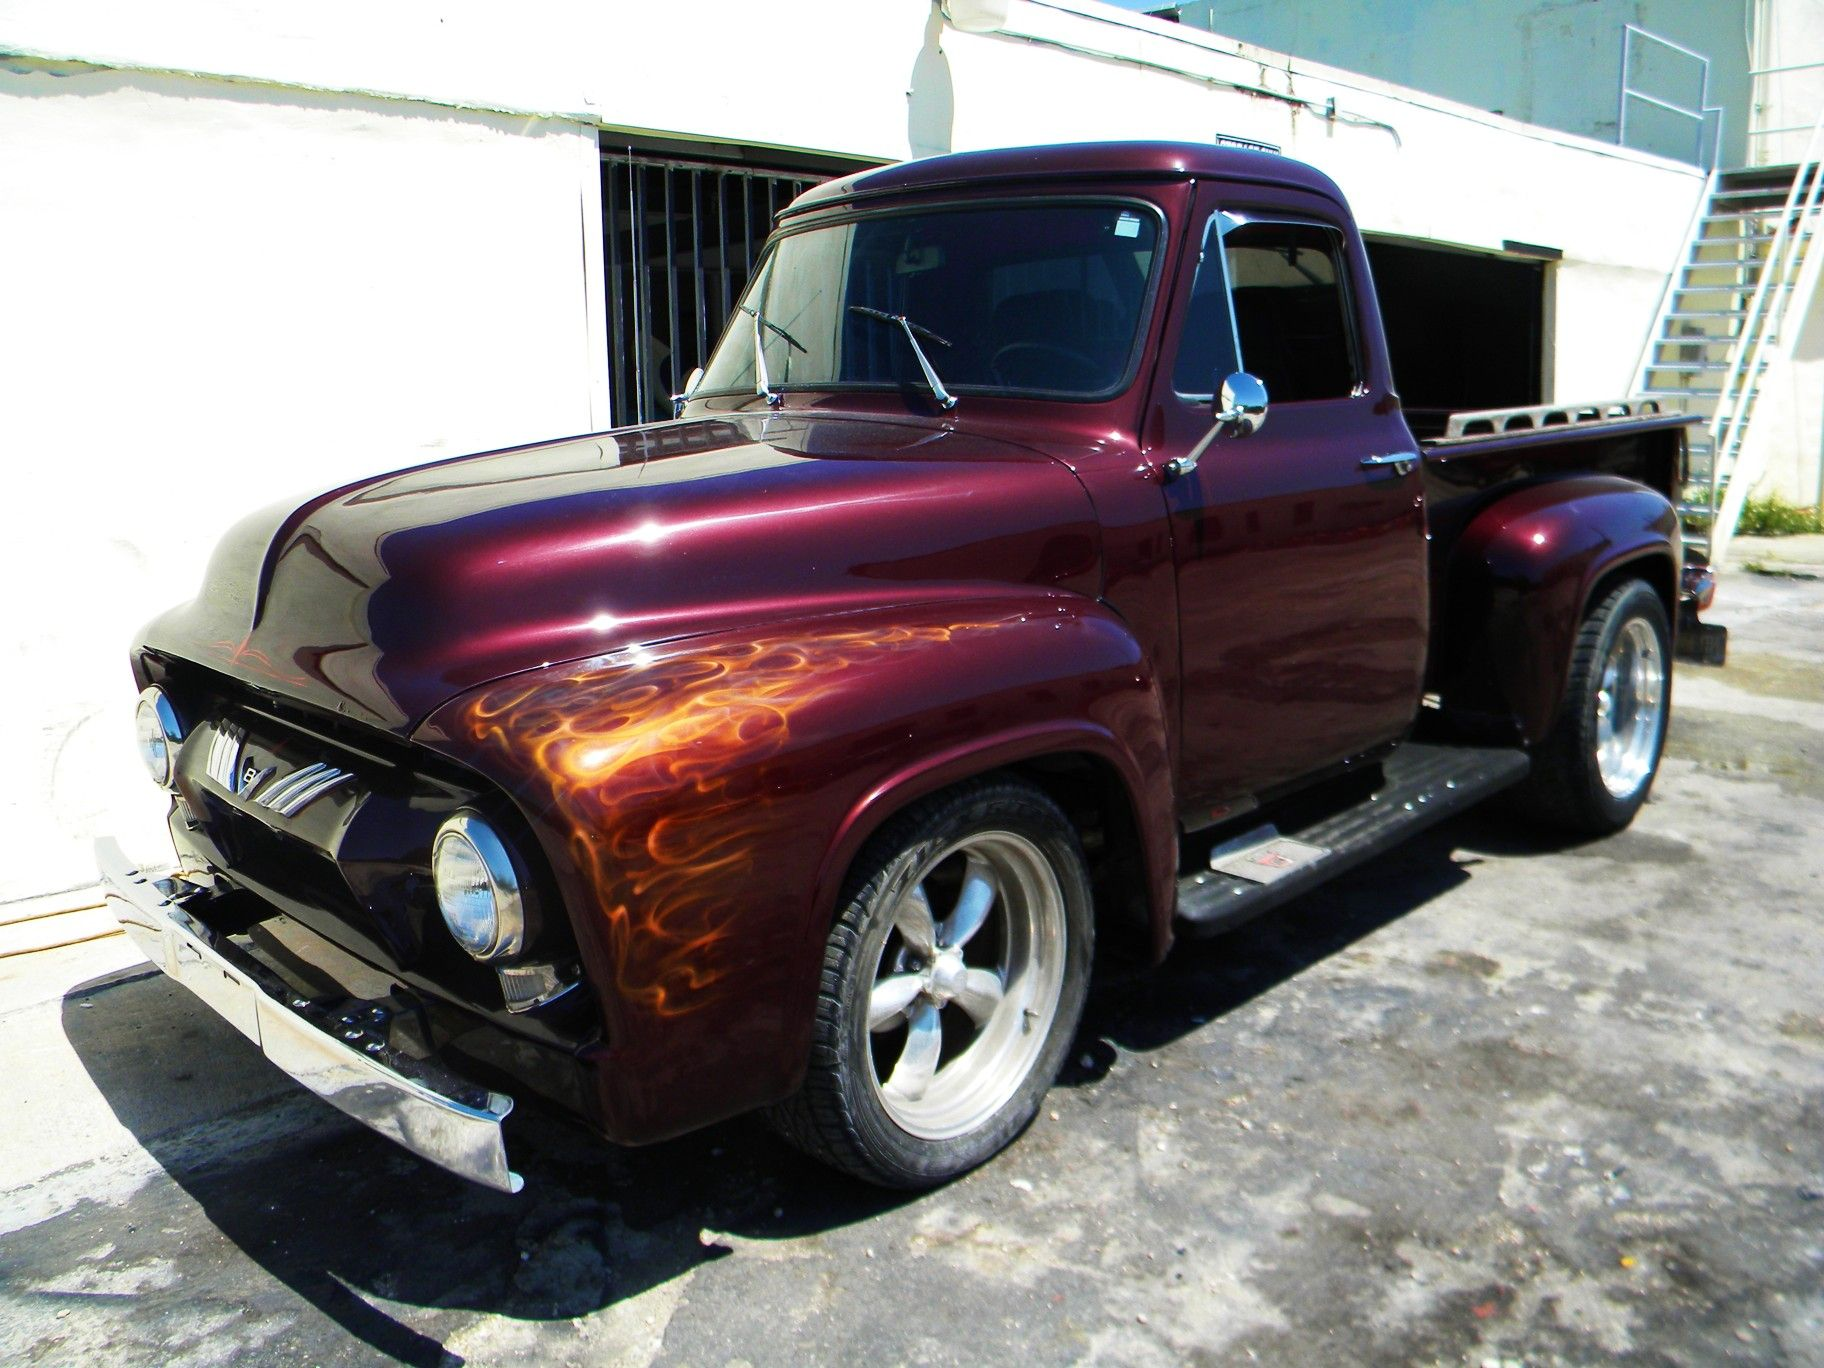 antique+cars+&+trucks+burgundy+colored | ... door Pick up Street ...